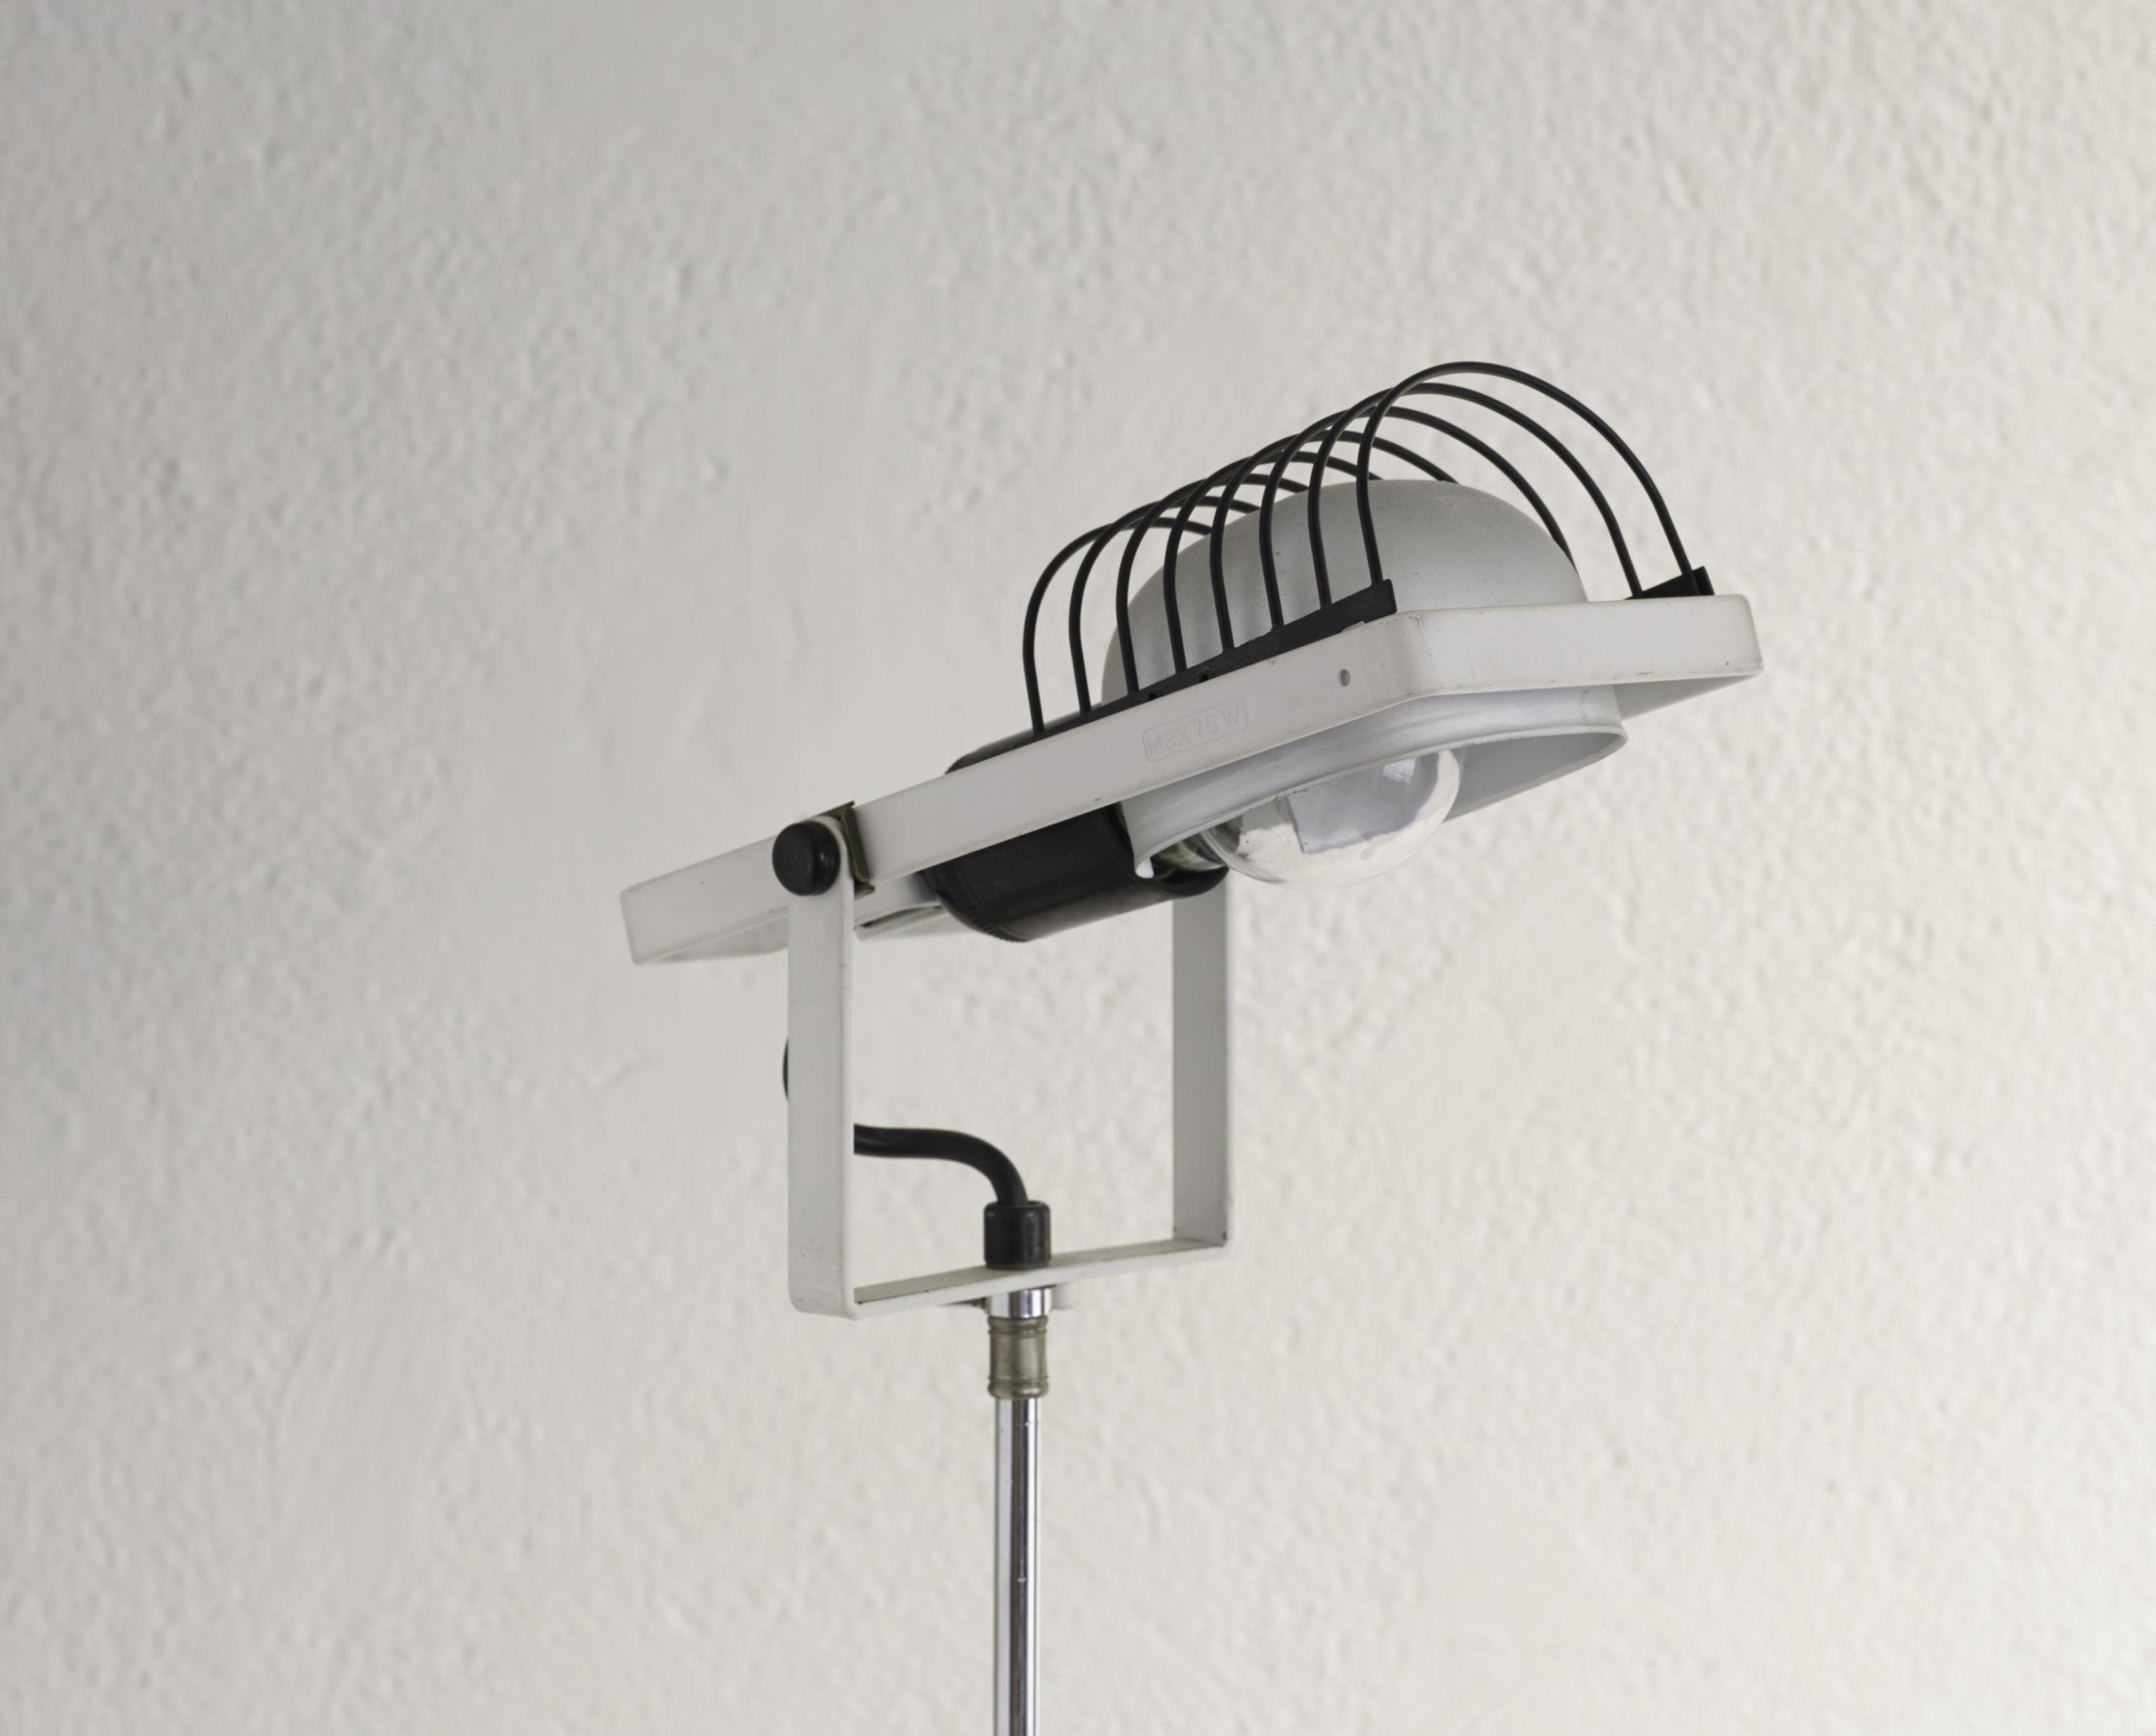 floor-lamp-sintesi-tripod-by-ernest-gismondi-image-02